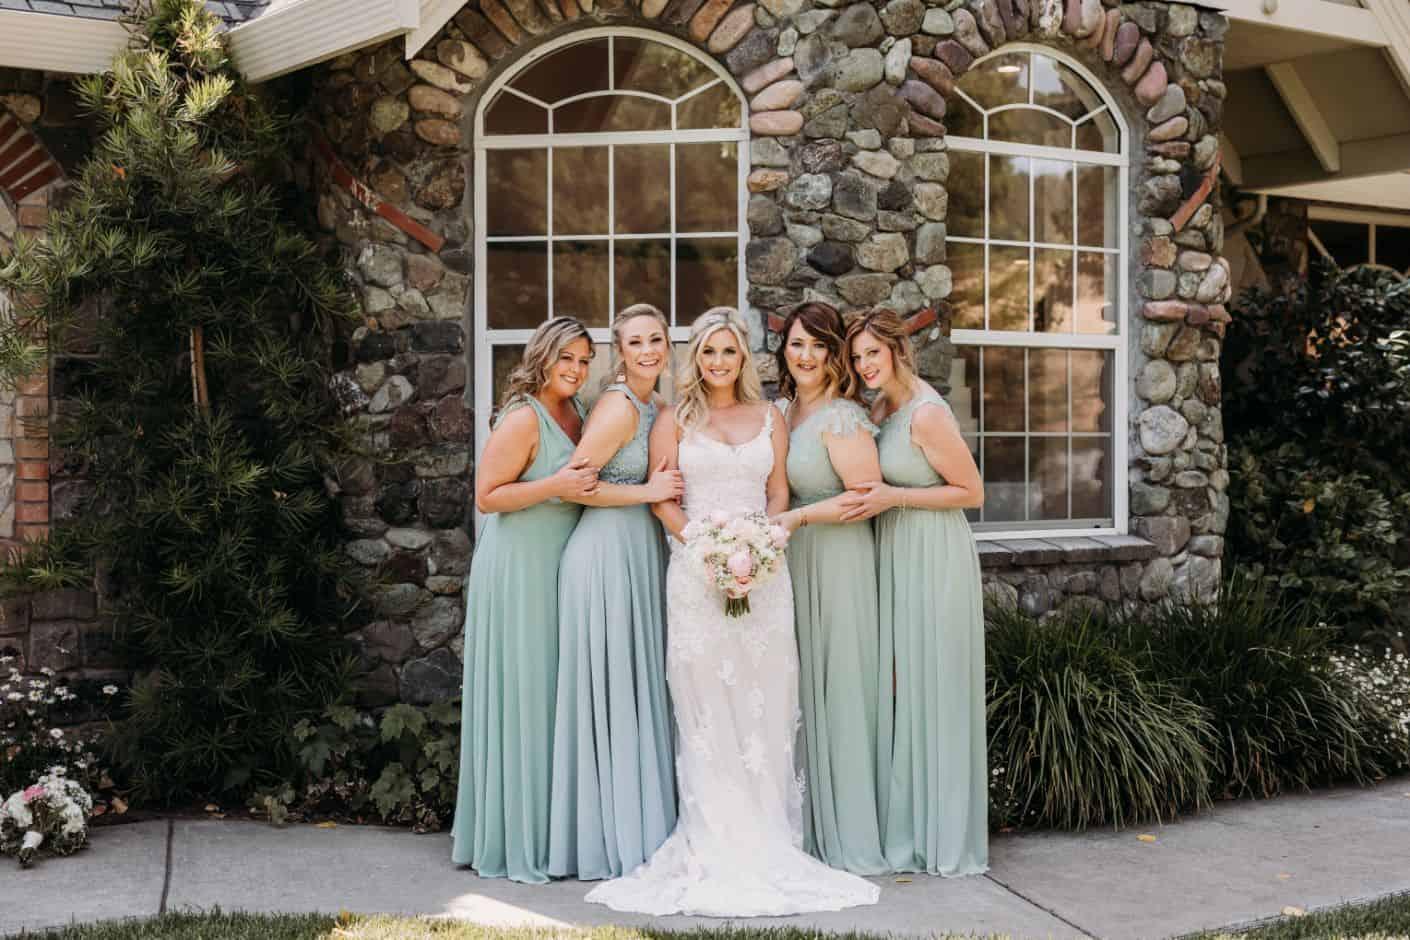 8 photo opportunities rustic mountain house estate weddingi venues northern california